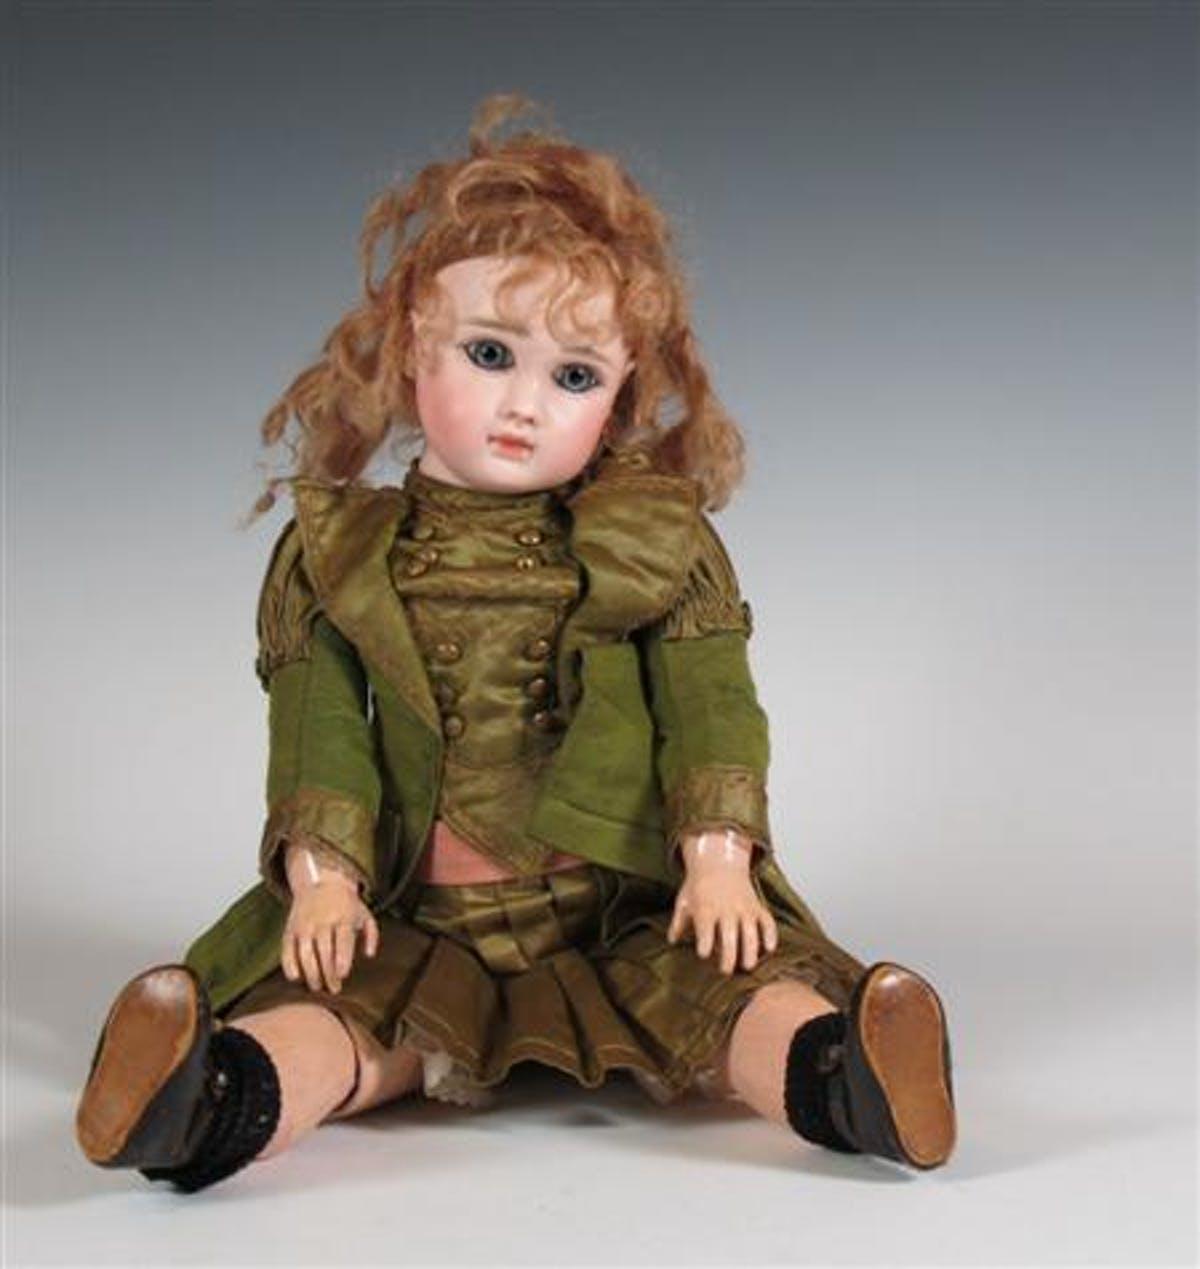 JULES STEINER. Muñeca de porcelana. Imagen vía: Barnebys